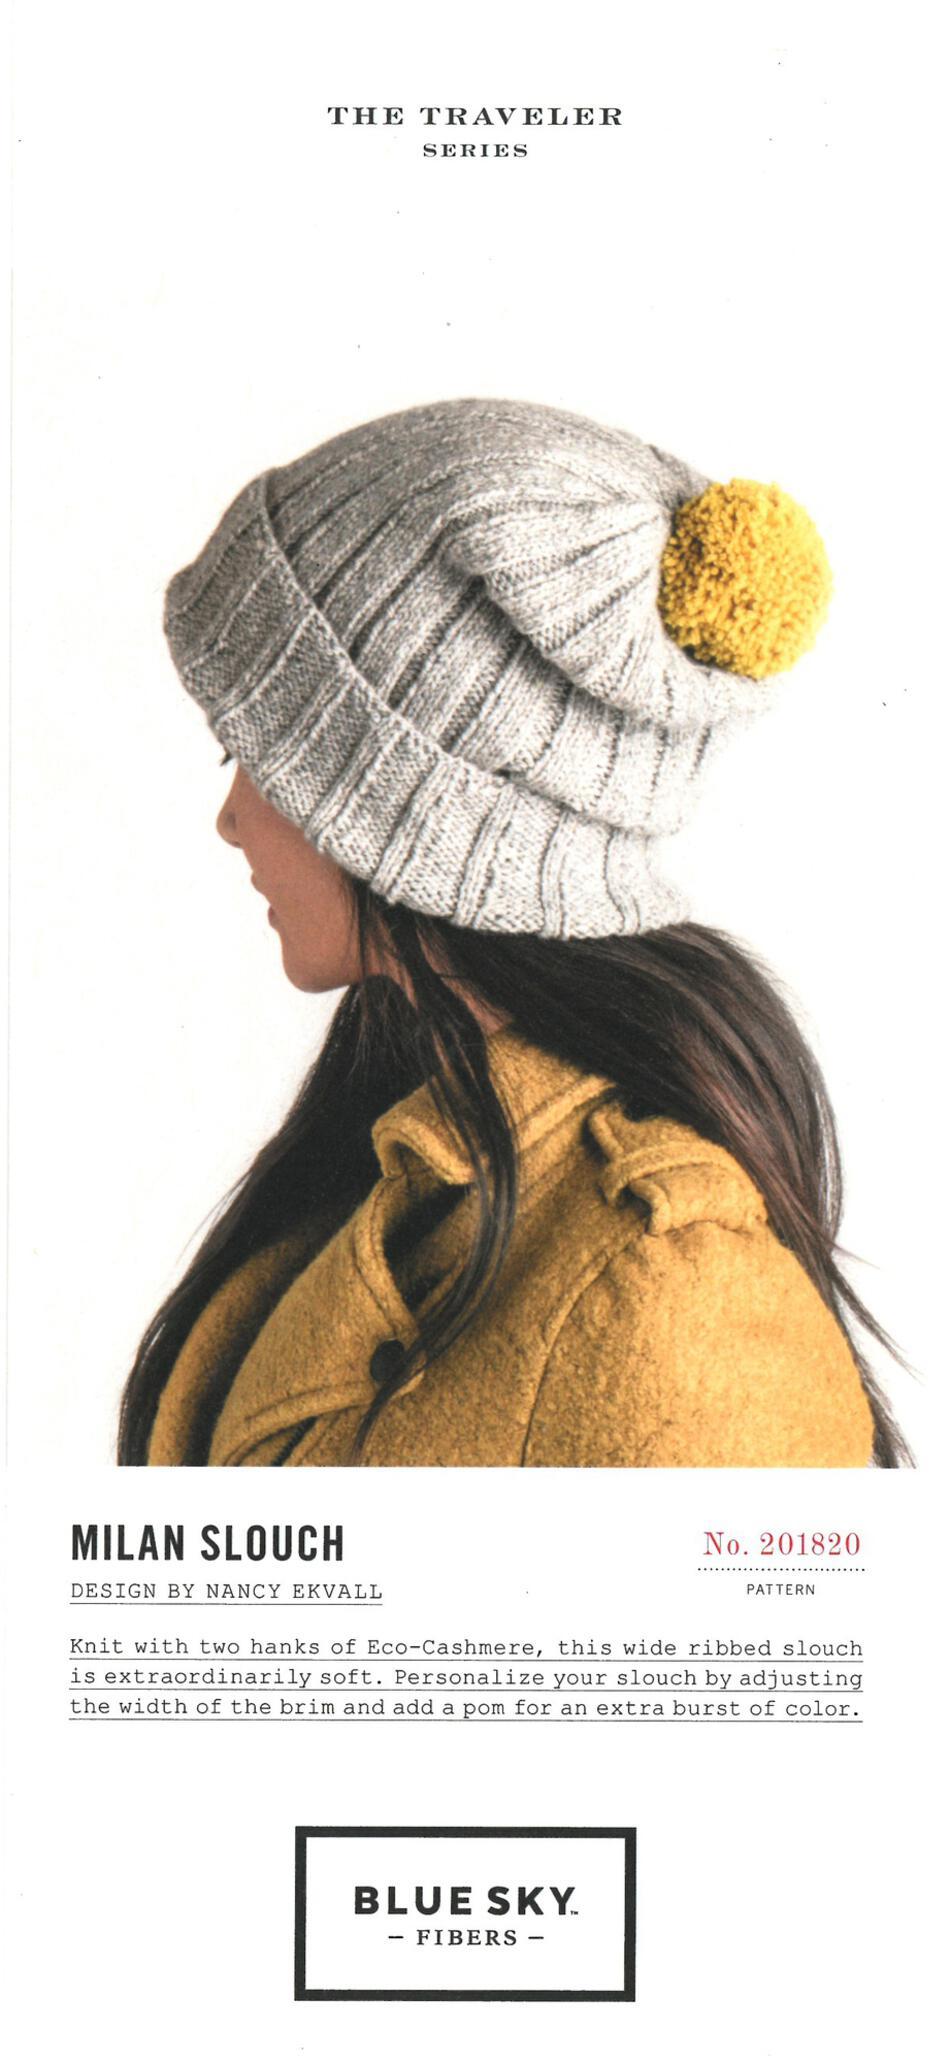 362ffb2dee5 Milan Slouch Knitting Pattern